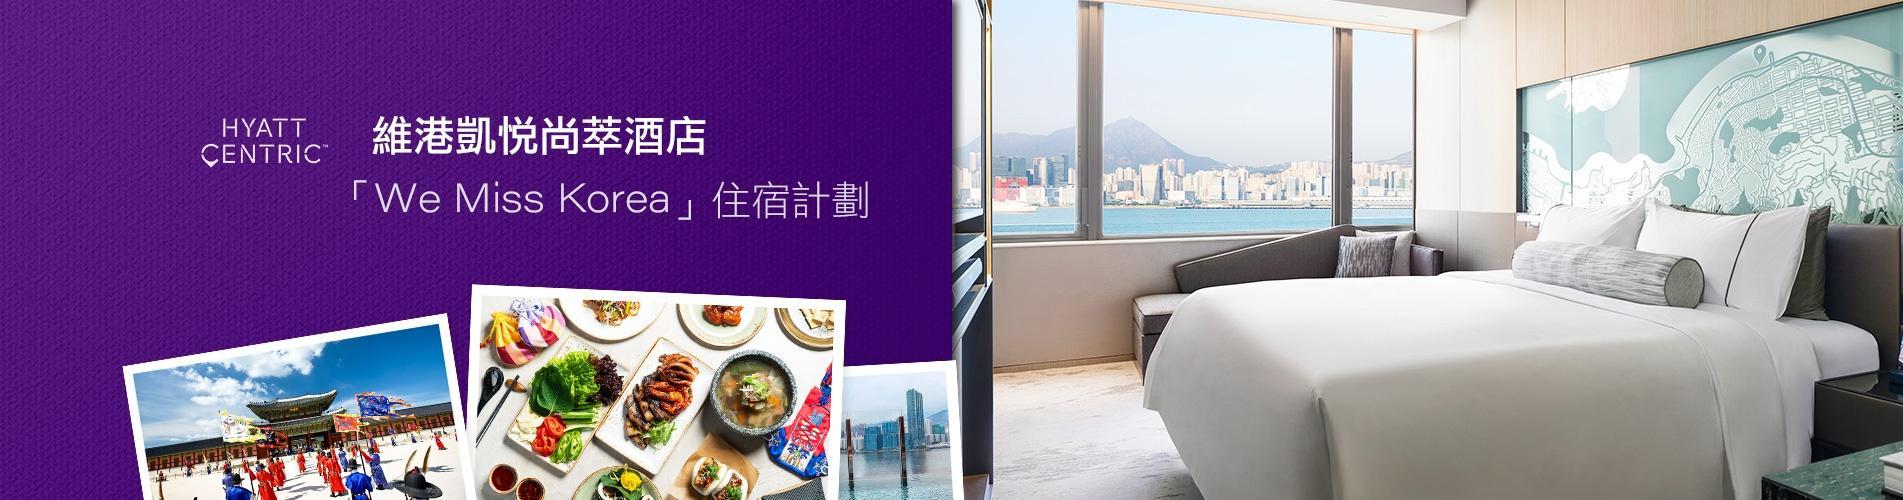 香港維港凱悅尚萃酒店  Hyatt Centric Victoria Harbour Hong Kong